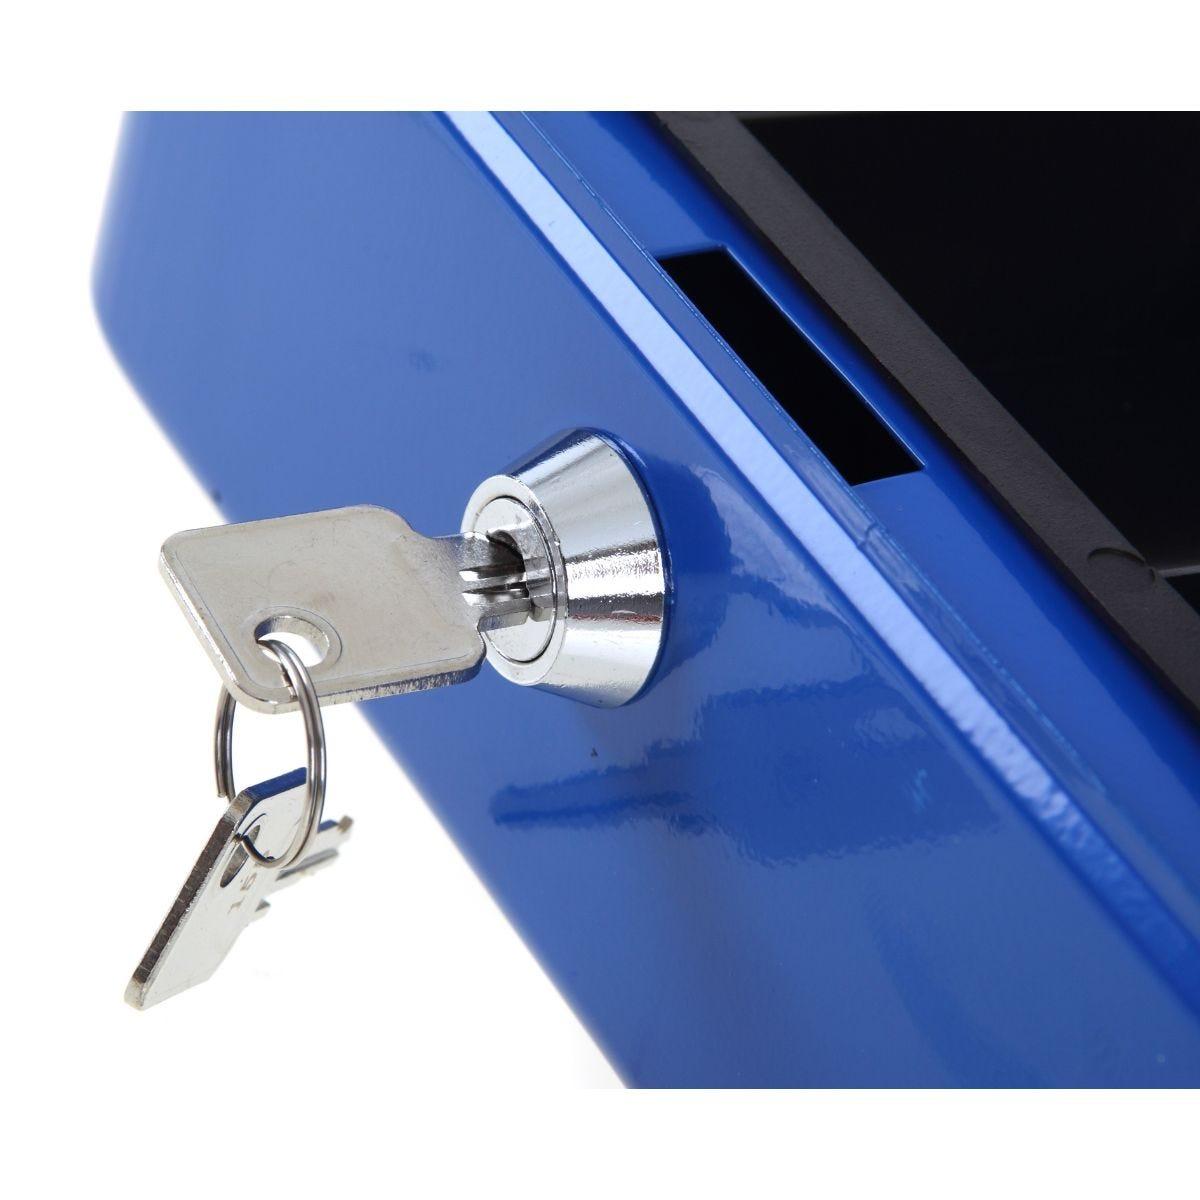 Ryman Button Release Cash Box H90xW200xD170mm